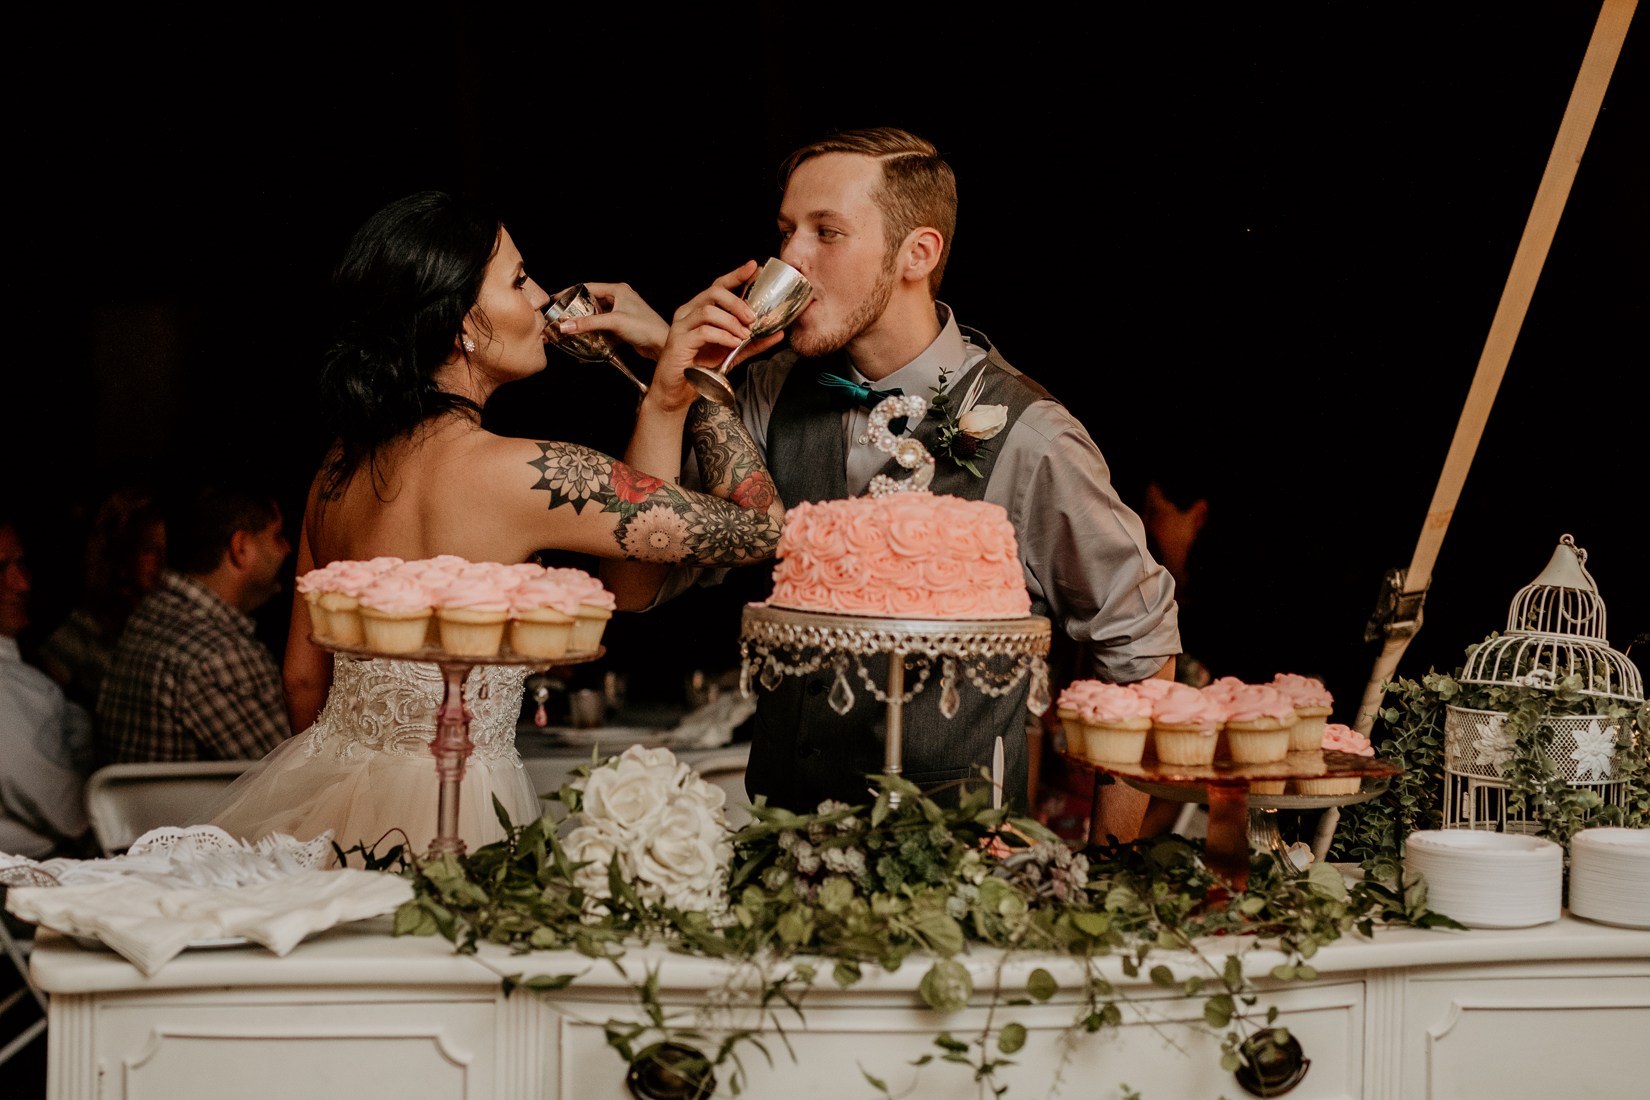 olivia_zay_wedding_09_2018-9954.jpg